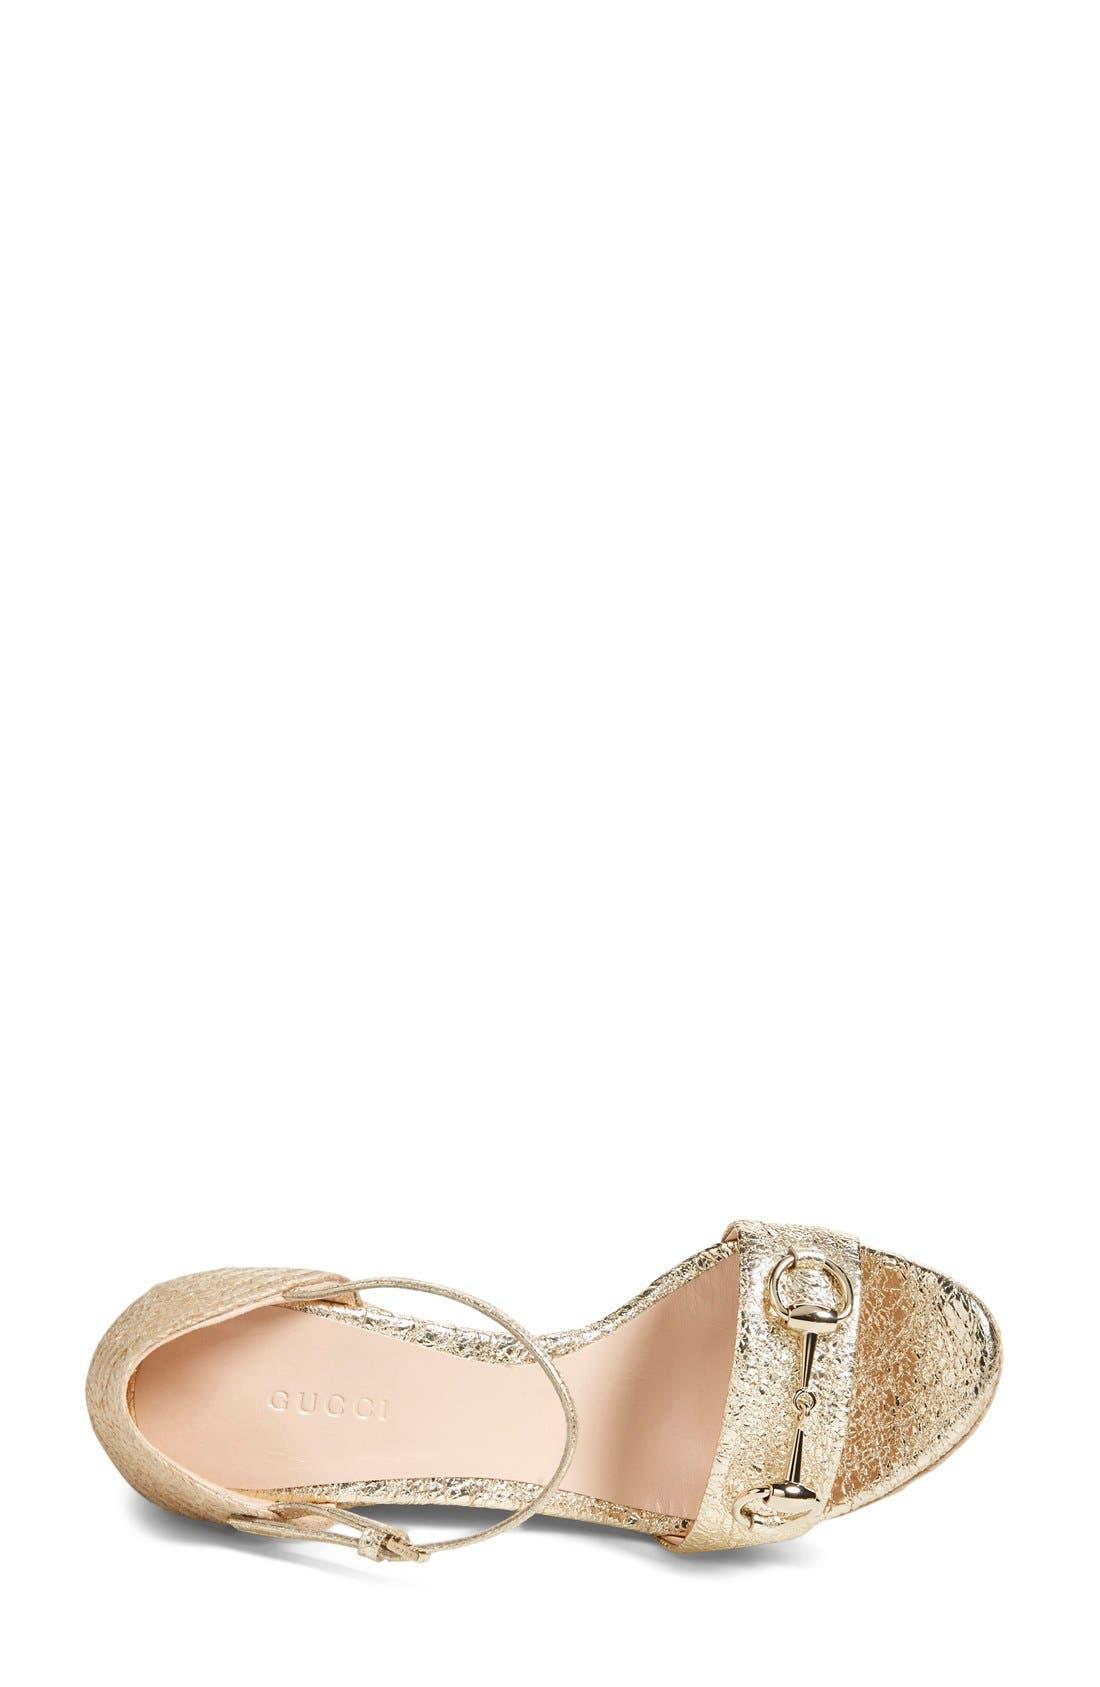 Alternate Image 3  - Gucci 'Carolina' Wedge Sandal (Women)